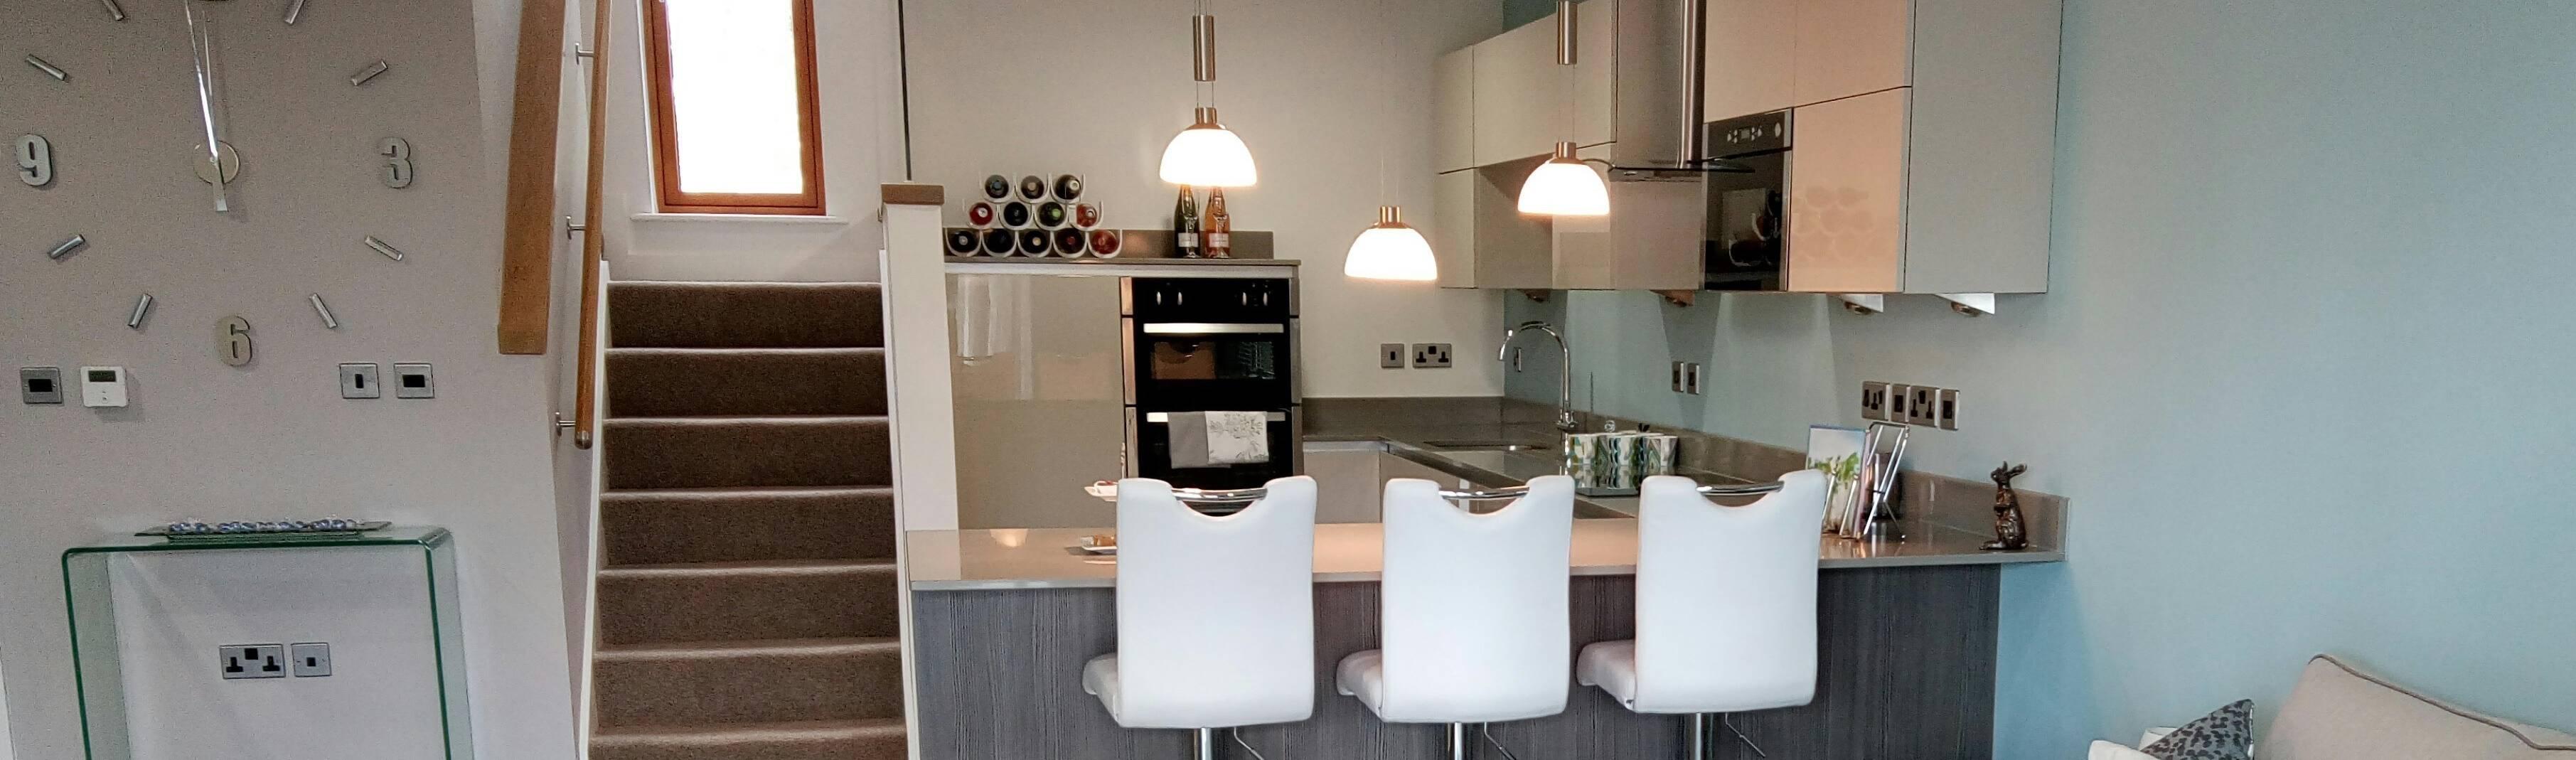 KAS Interior Design